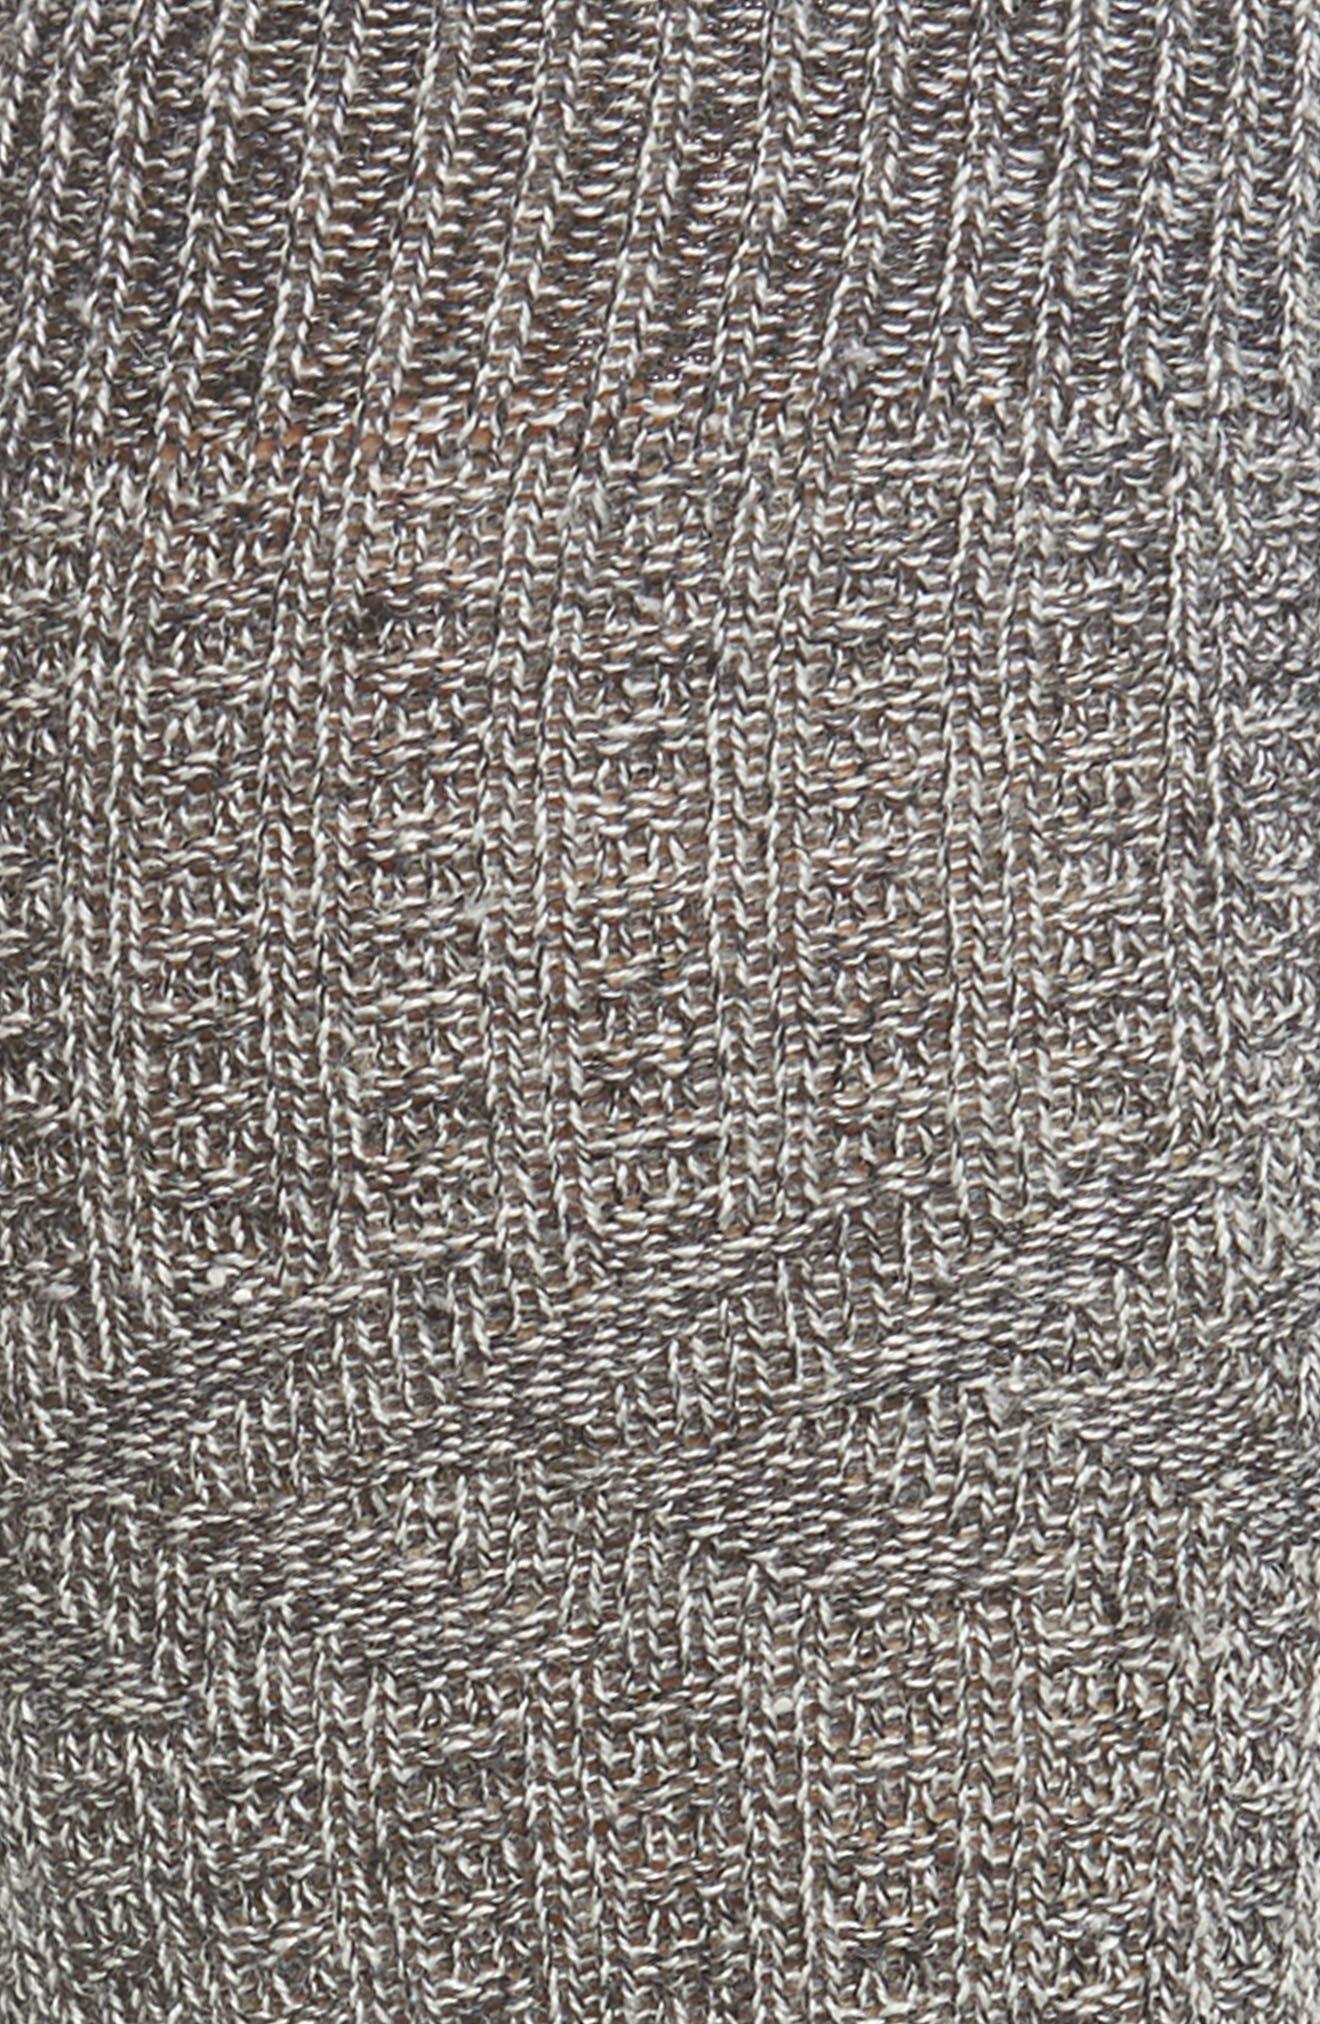 Wheat Fields Knee High Socks,                             Alternate thumbnail 2, color,                             CHARCOAL HEATHER-WINTER WHITE